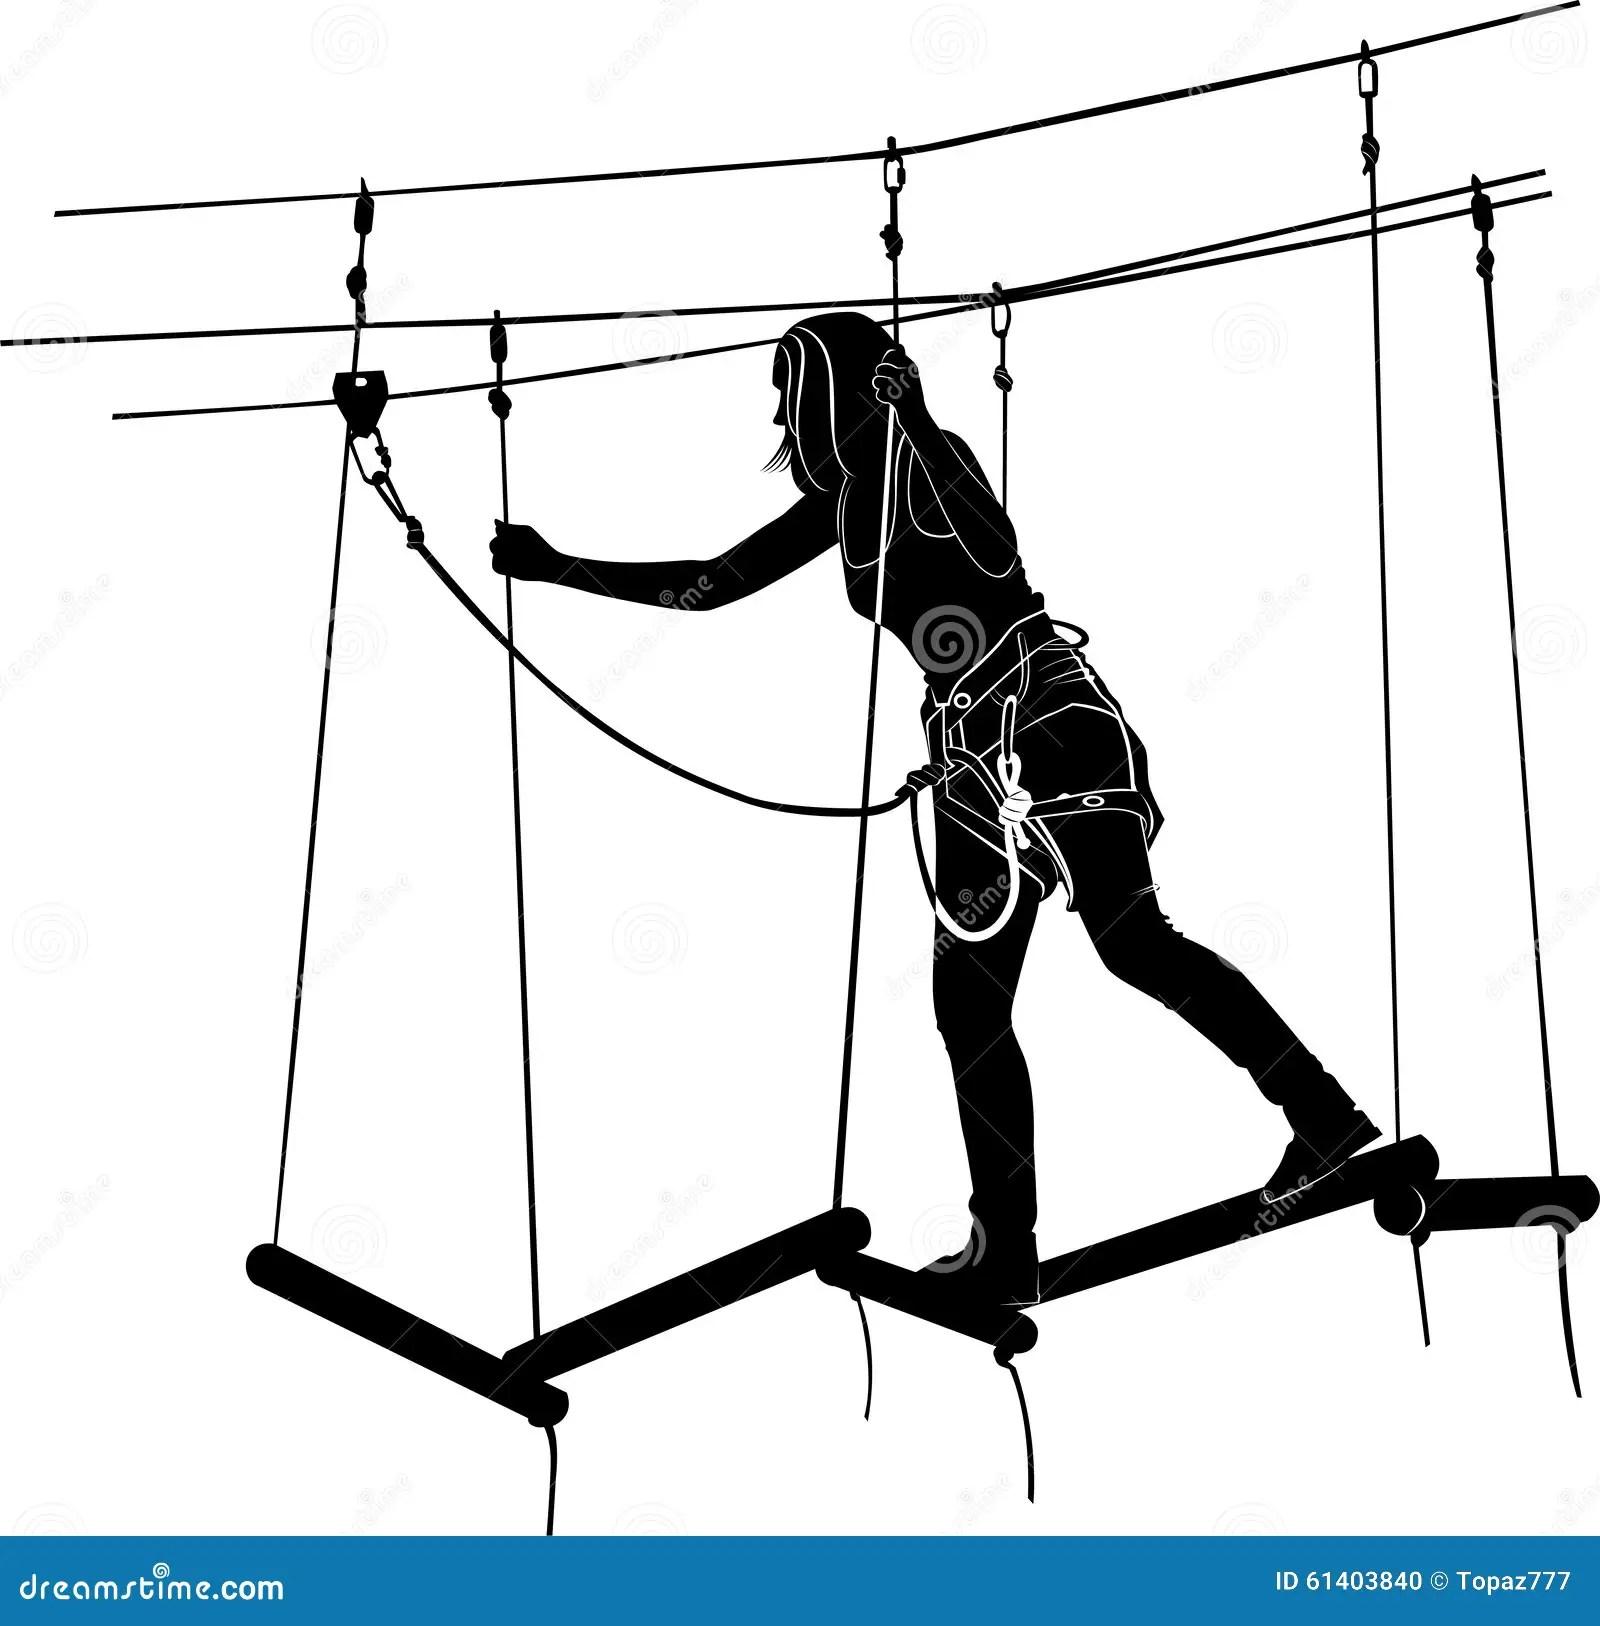 Adventure Park Rope Ladder Cartoon Vector